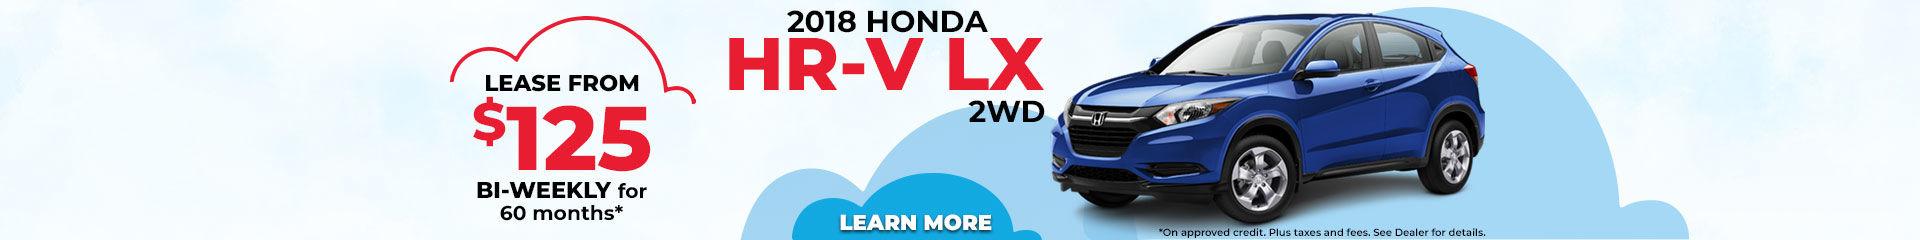 Lease the 2018 Honda HR-V LX